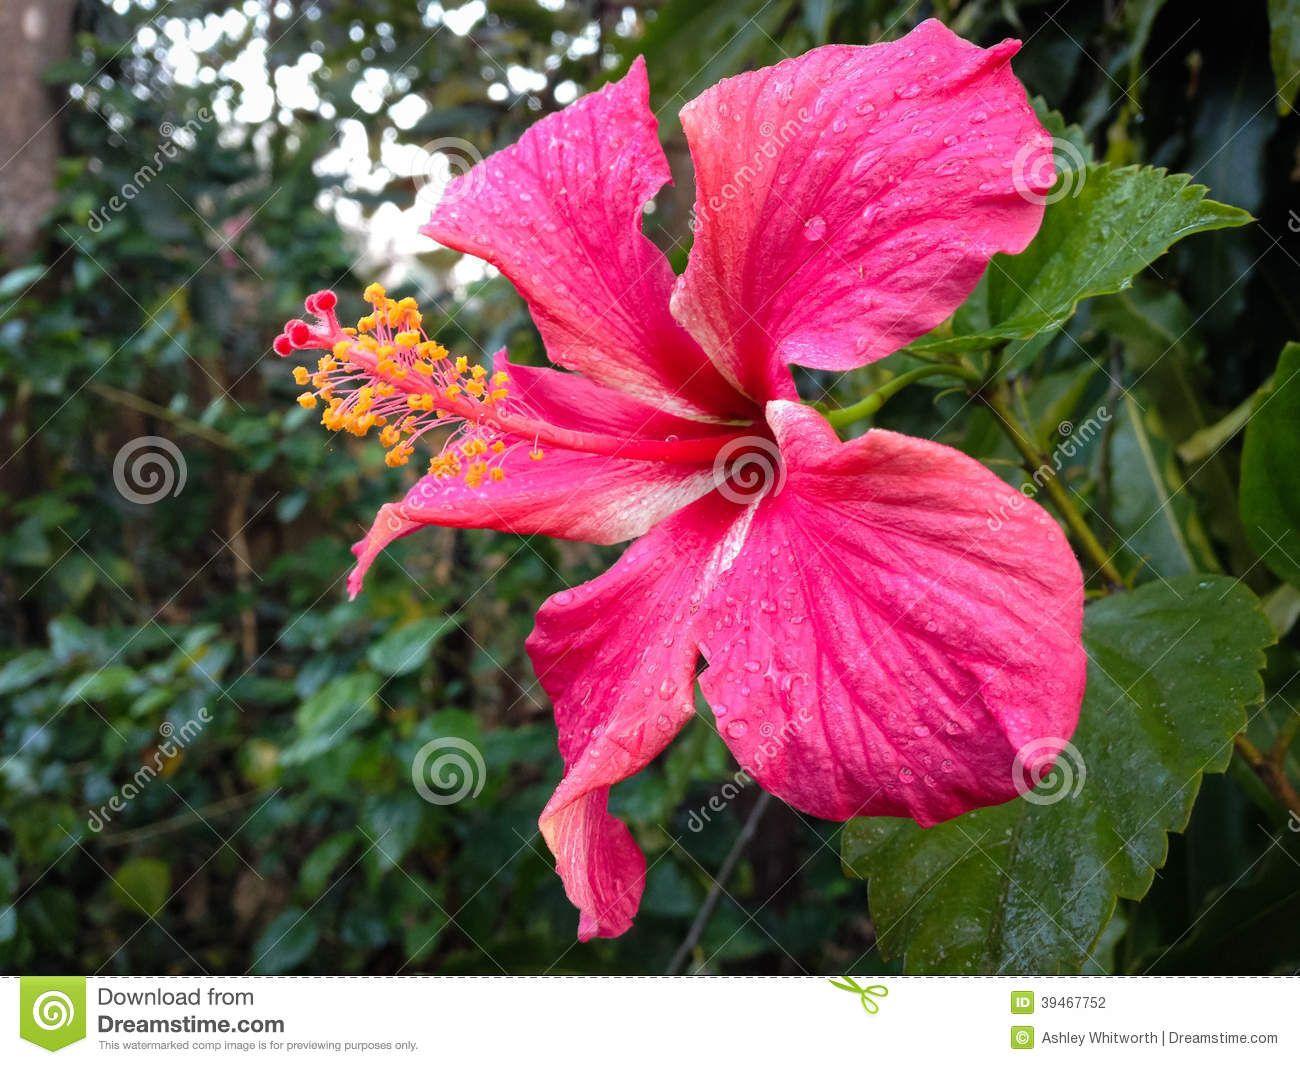 Photo About Hibiscus Flower In Lodge Garden Thakurdwara Bardia Nepal Image Of Nepal Vegetation Park 39467752 Hibiscus Hibiscus Flowers Flowers